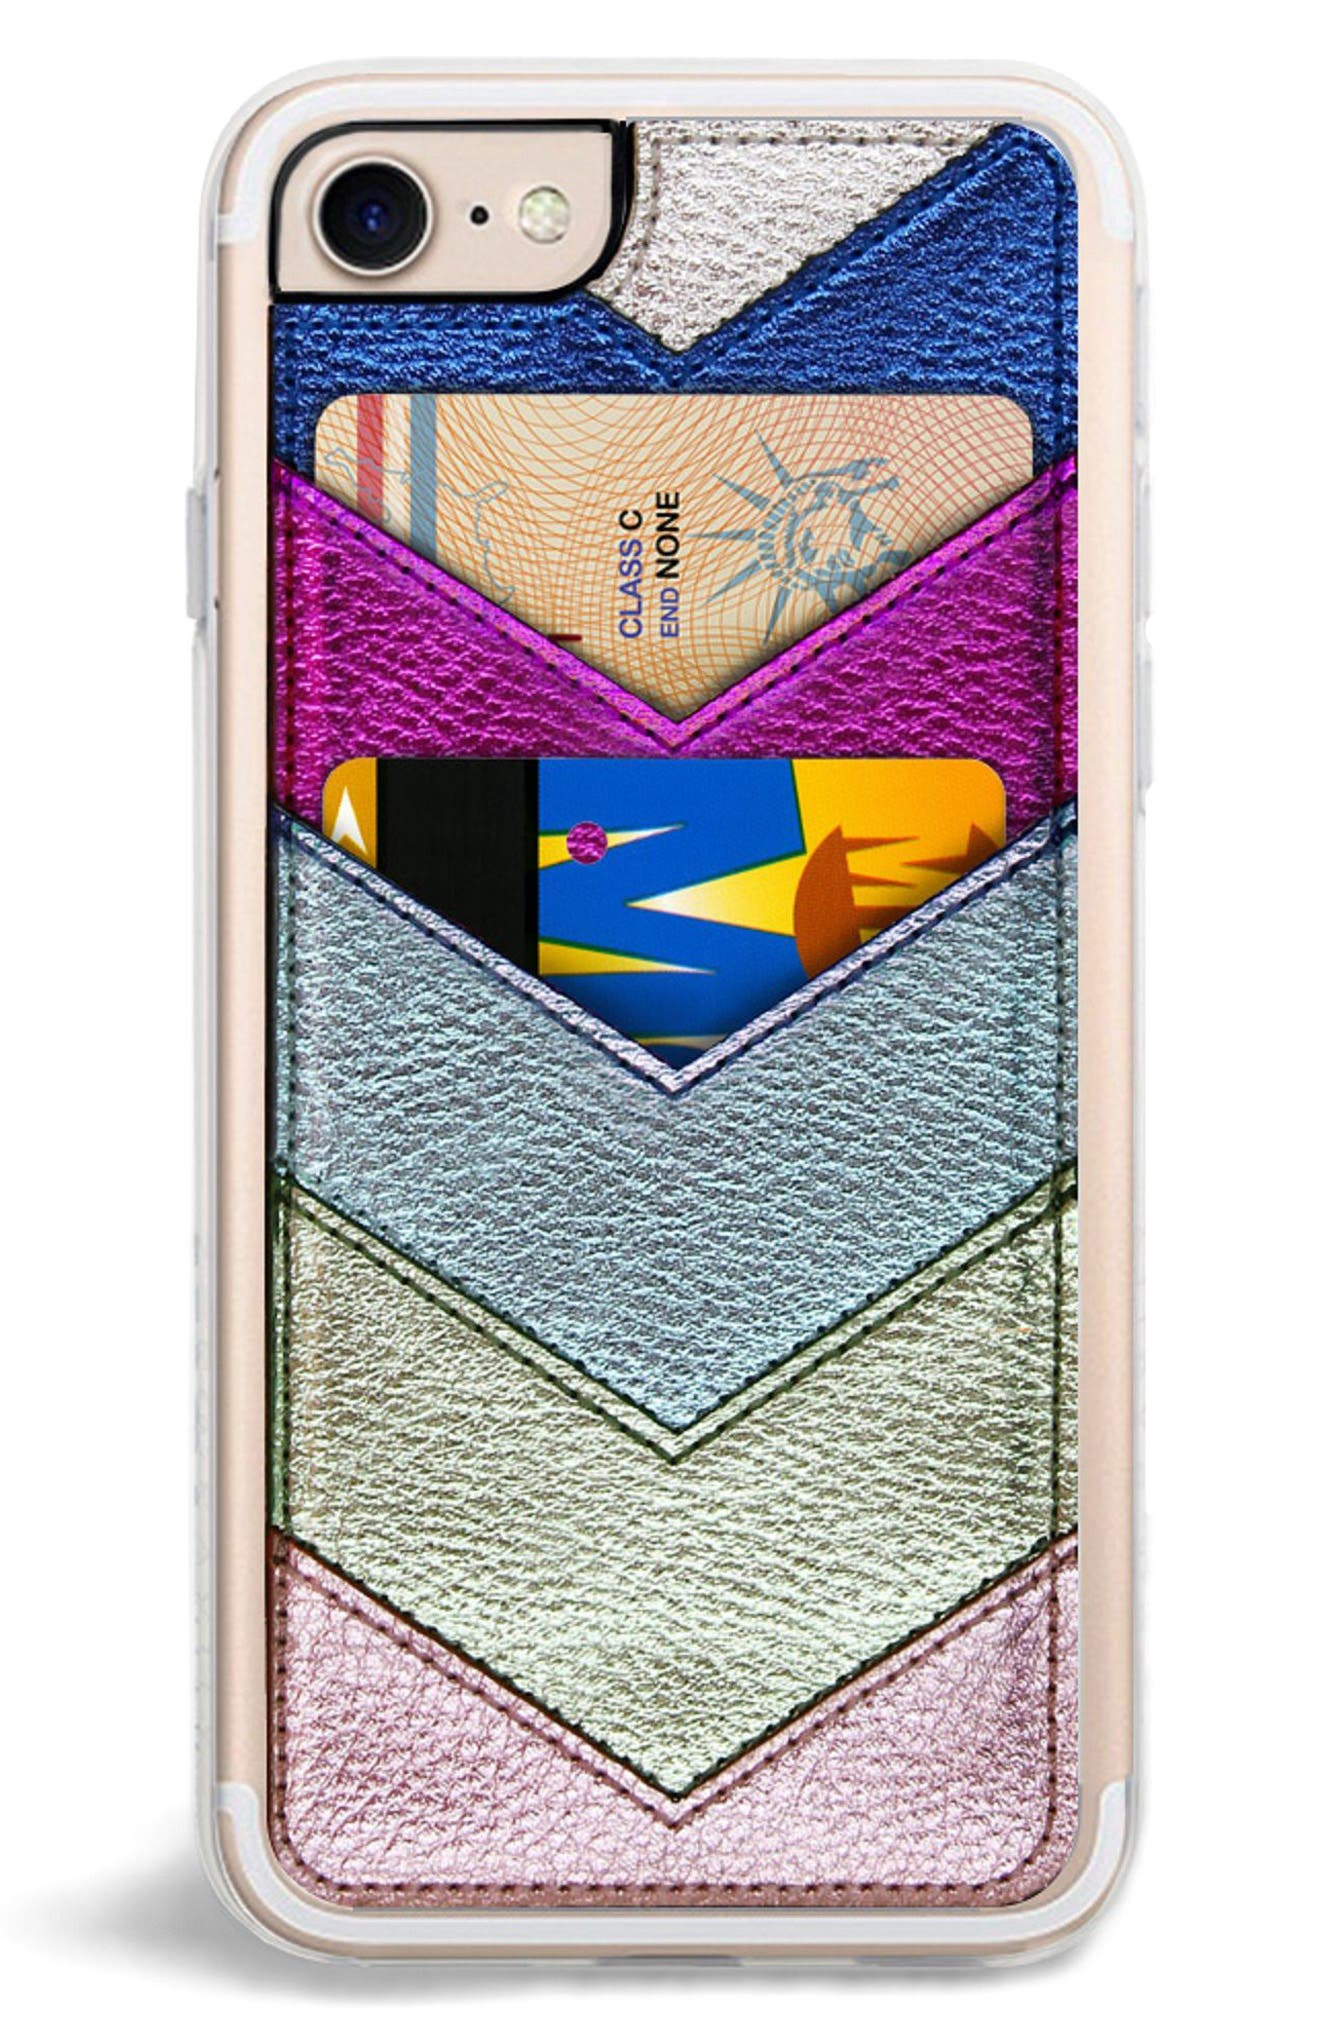 Chevron Faux Leather iPhone 6/6s/7/8 & 6/6s/7/8 Plus Case,                             Main thumbnail 1, color,                             Metallic Multi